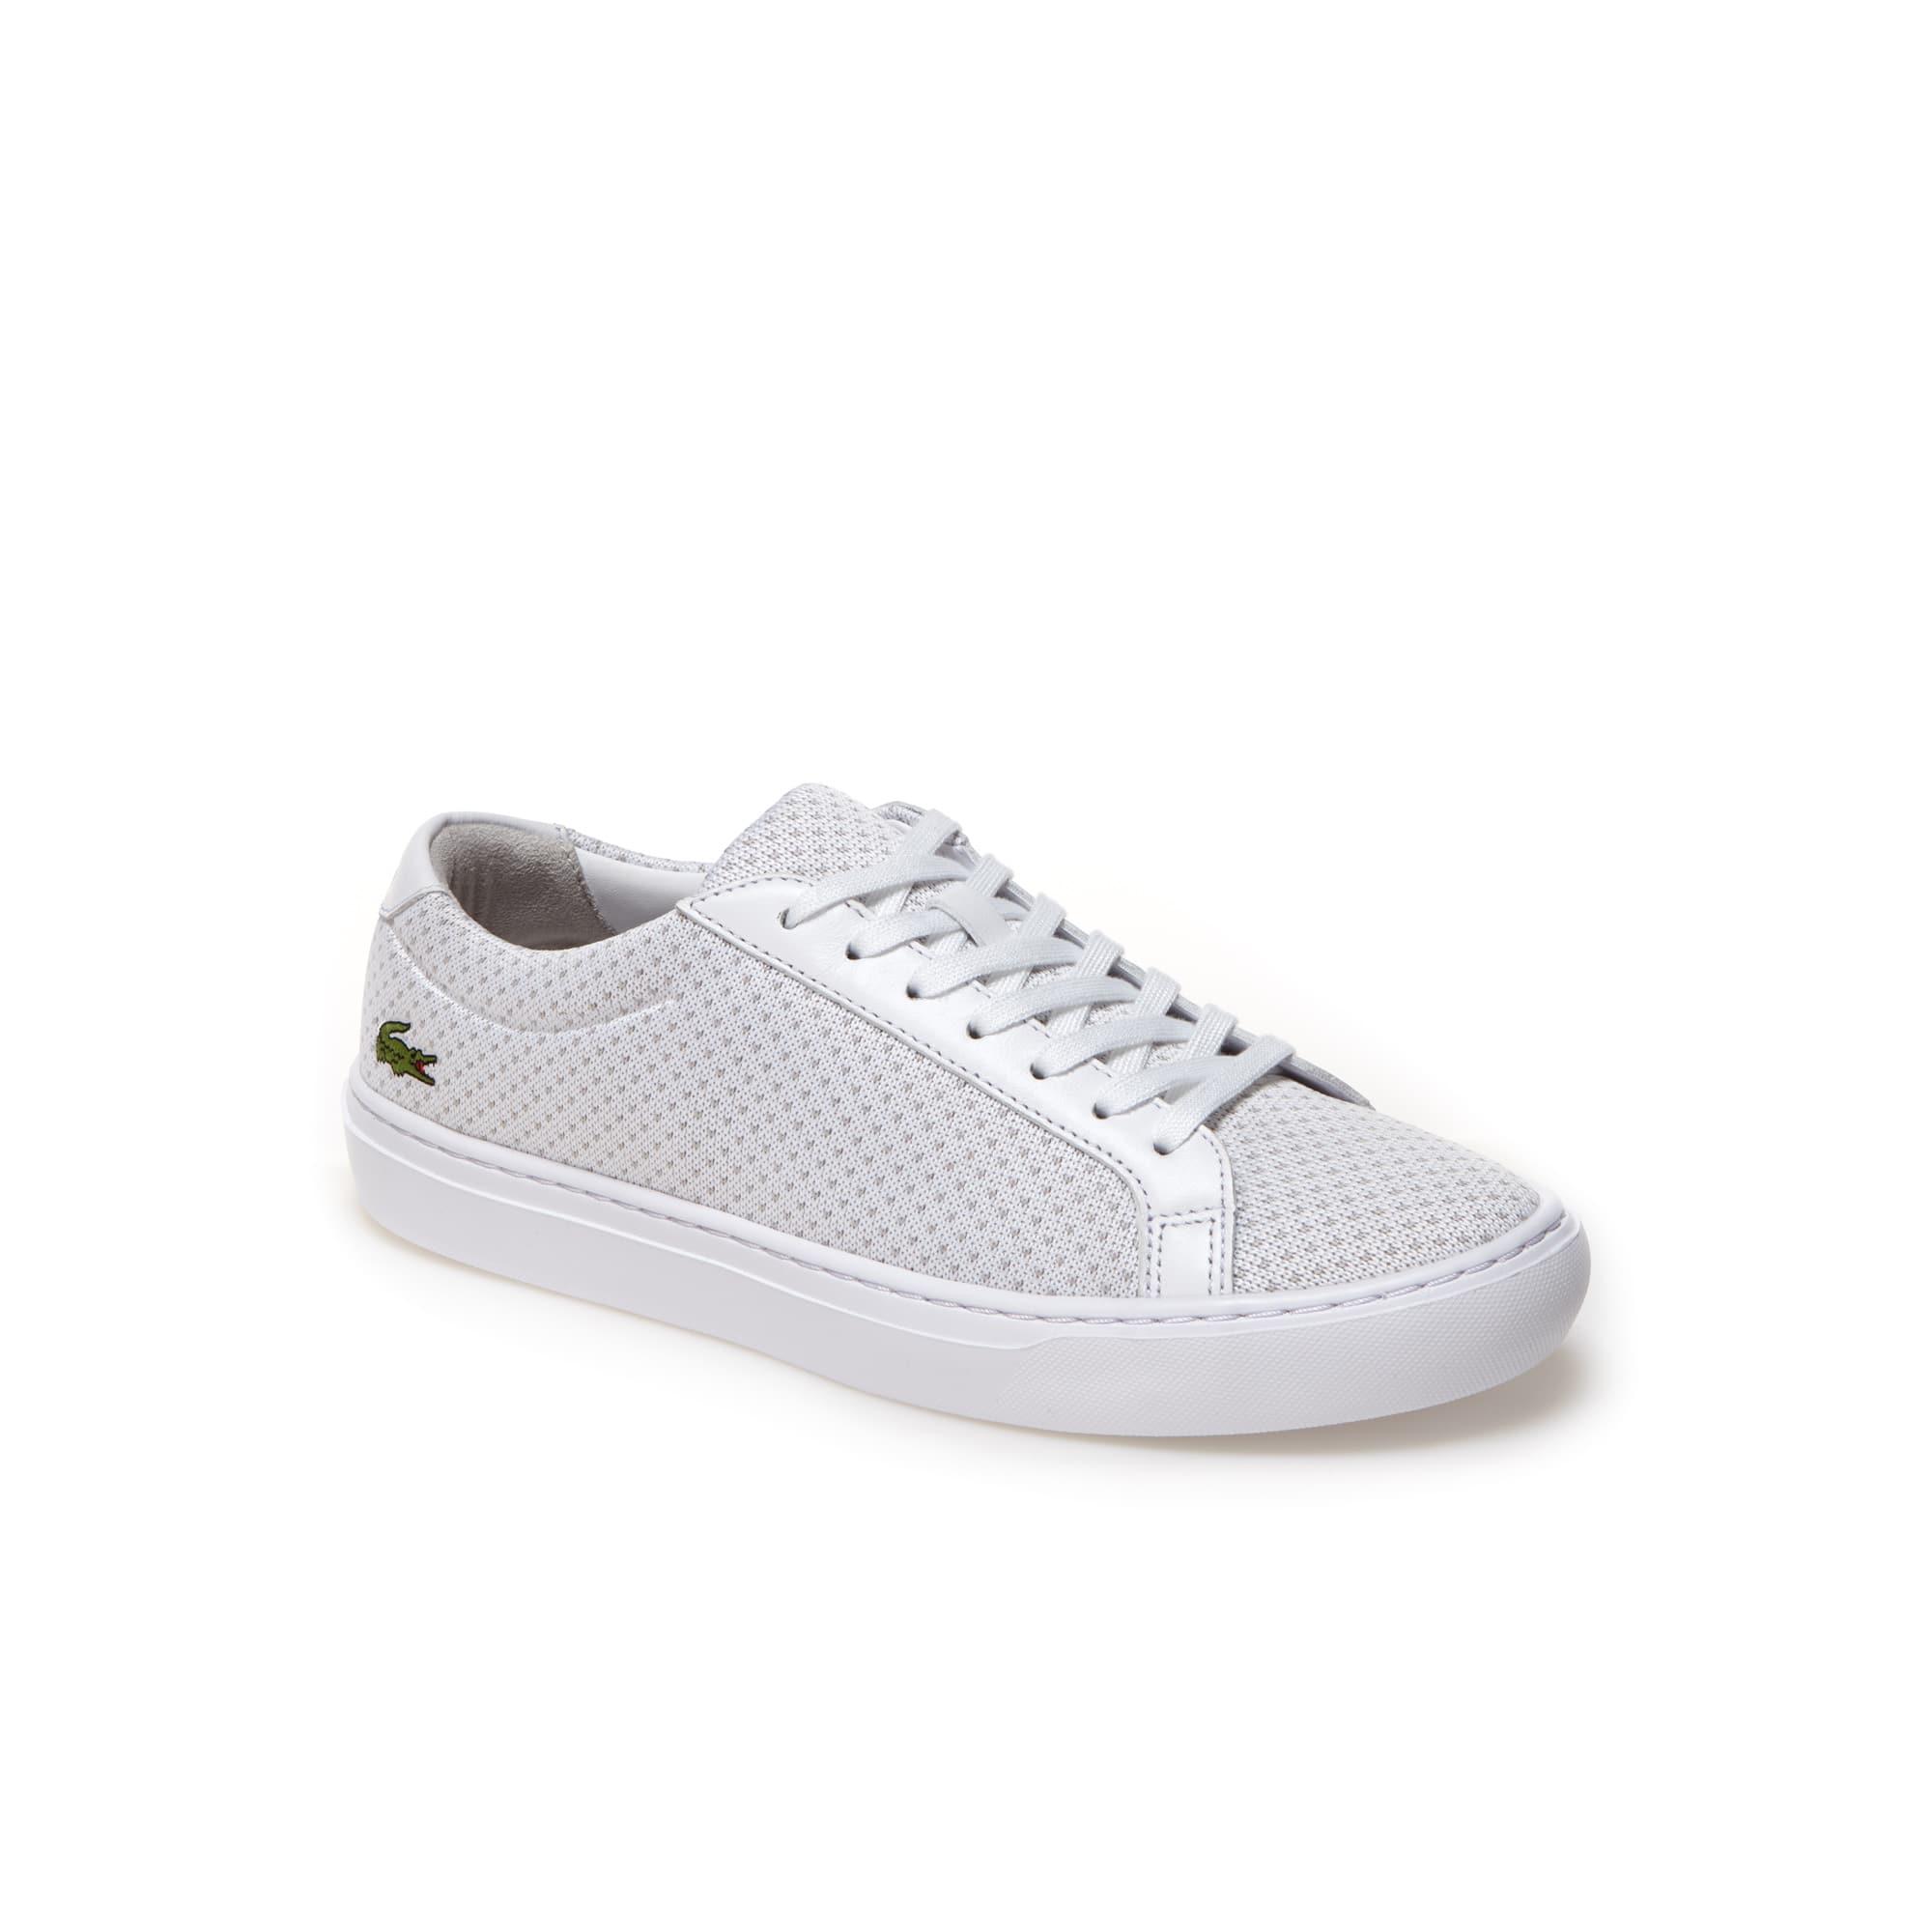 7d1096a22 أحذية LACOSTE للرجال: أحذية رياضية وأحذية طويلة الساق | LACOSTE